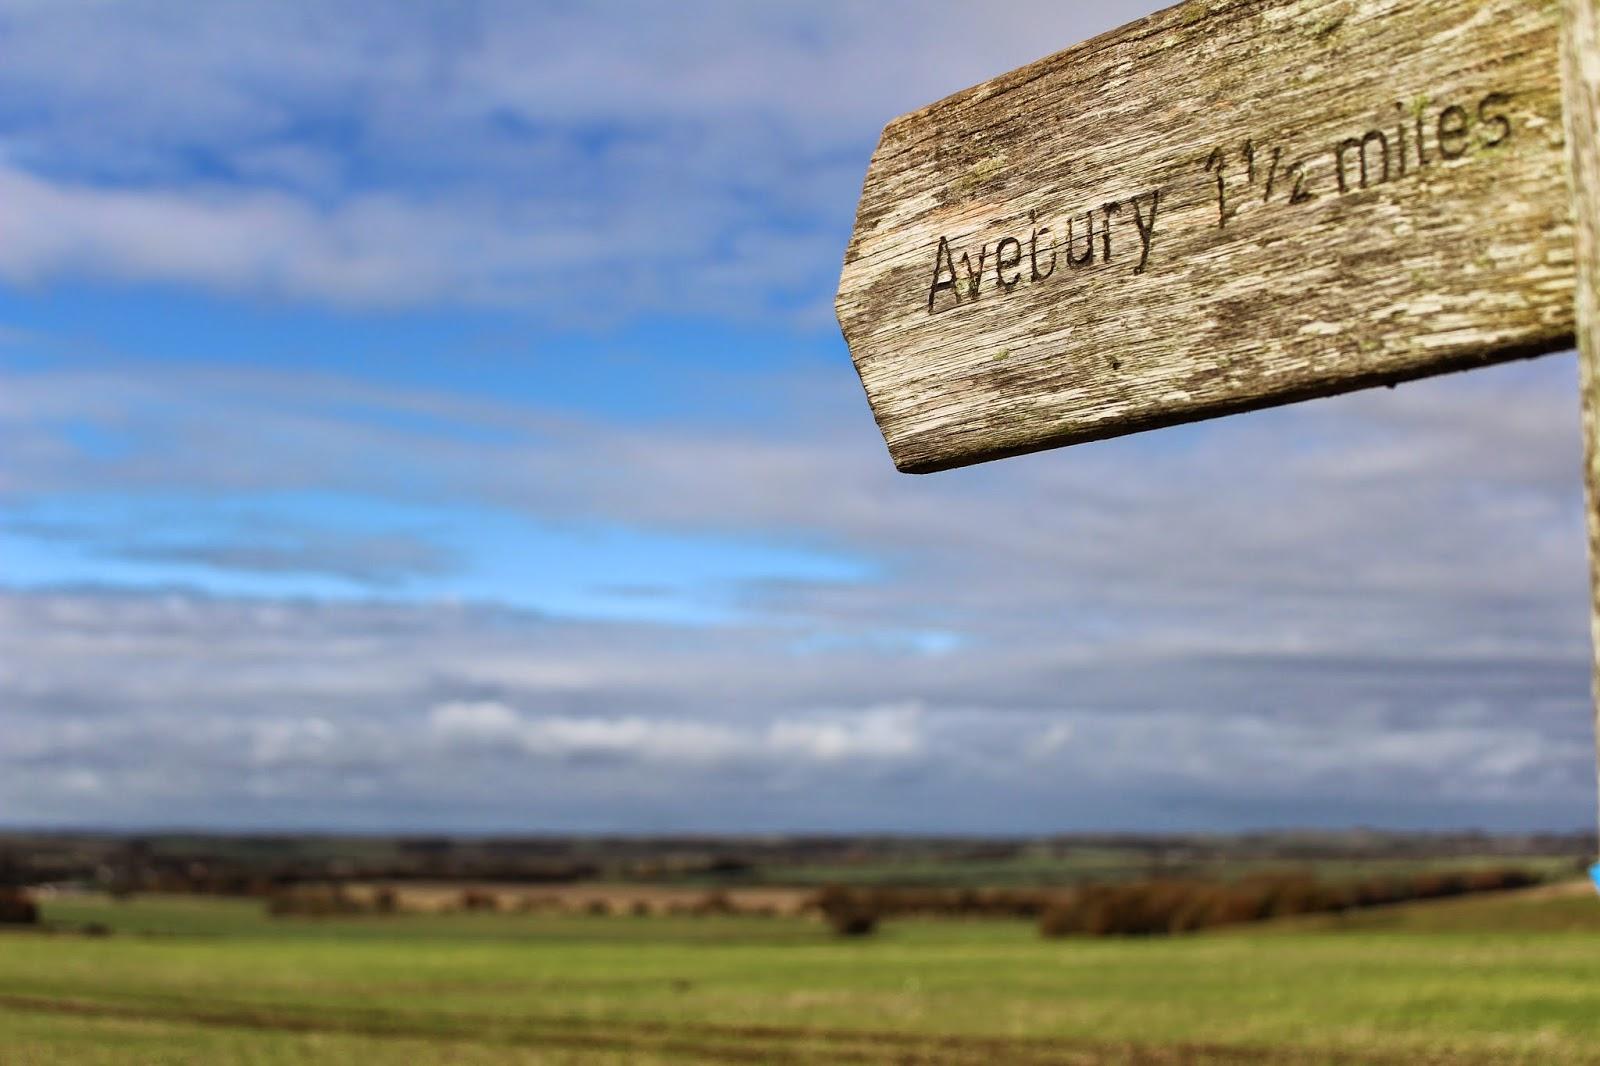 Project 365 day 298 - Avebury // 76sunflowers